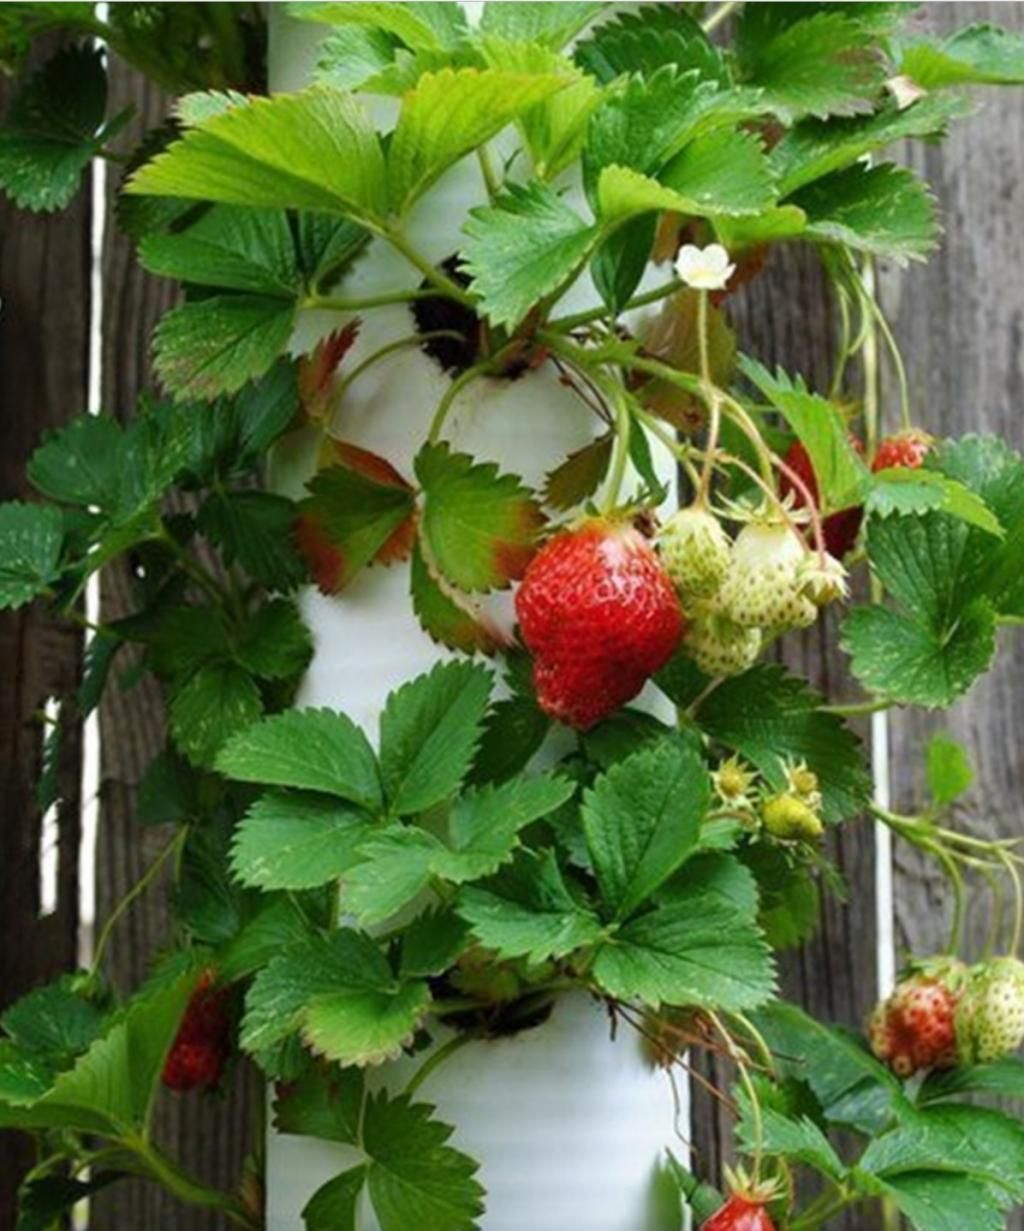 Medium Of Pvc Pipe Gardening Projects